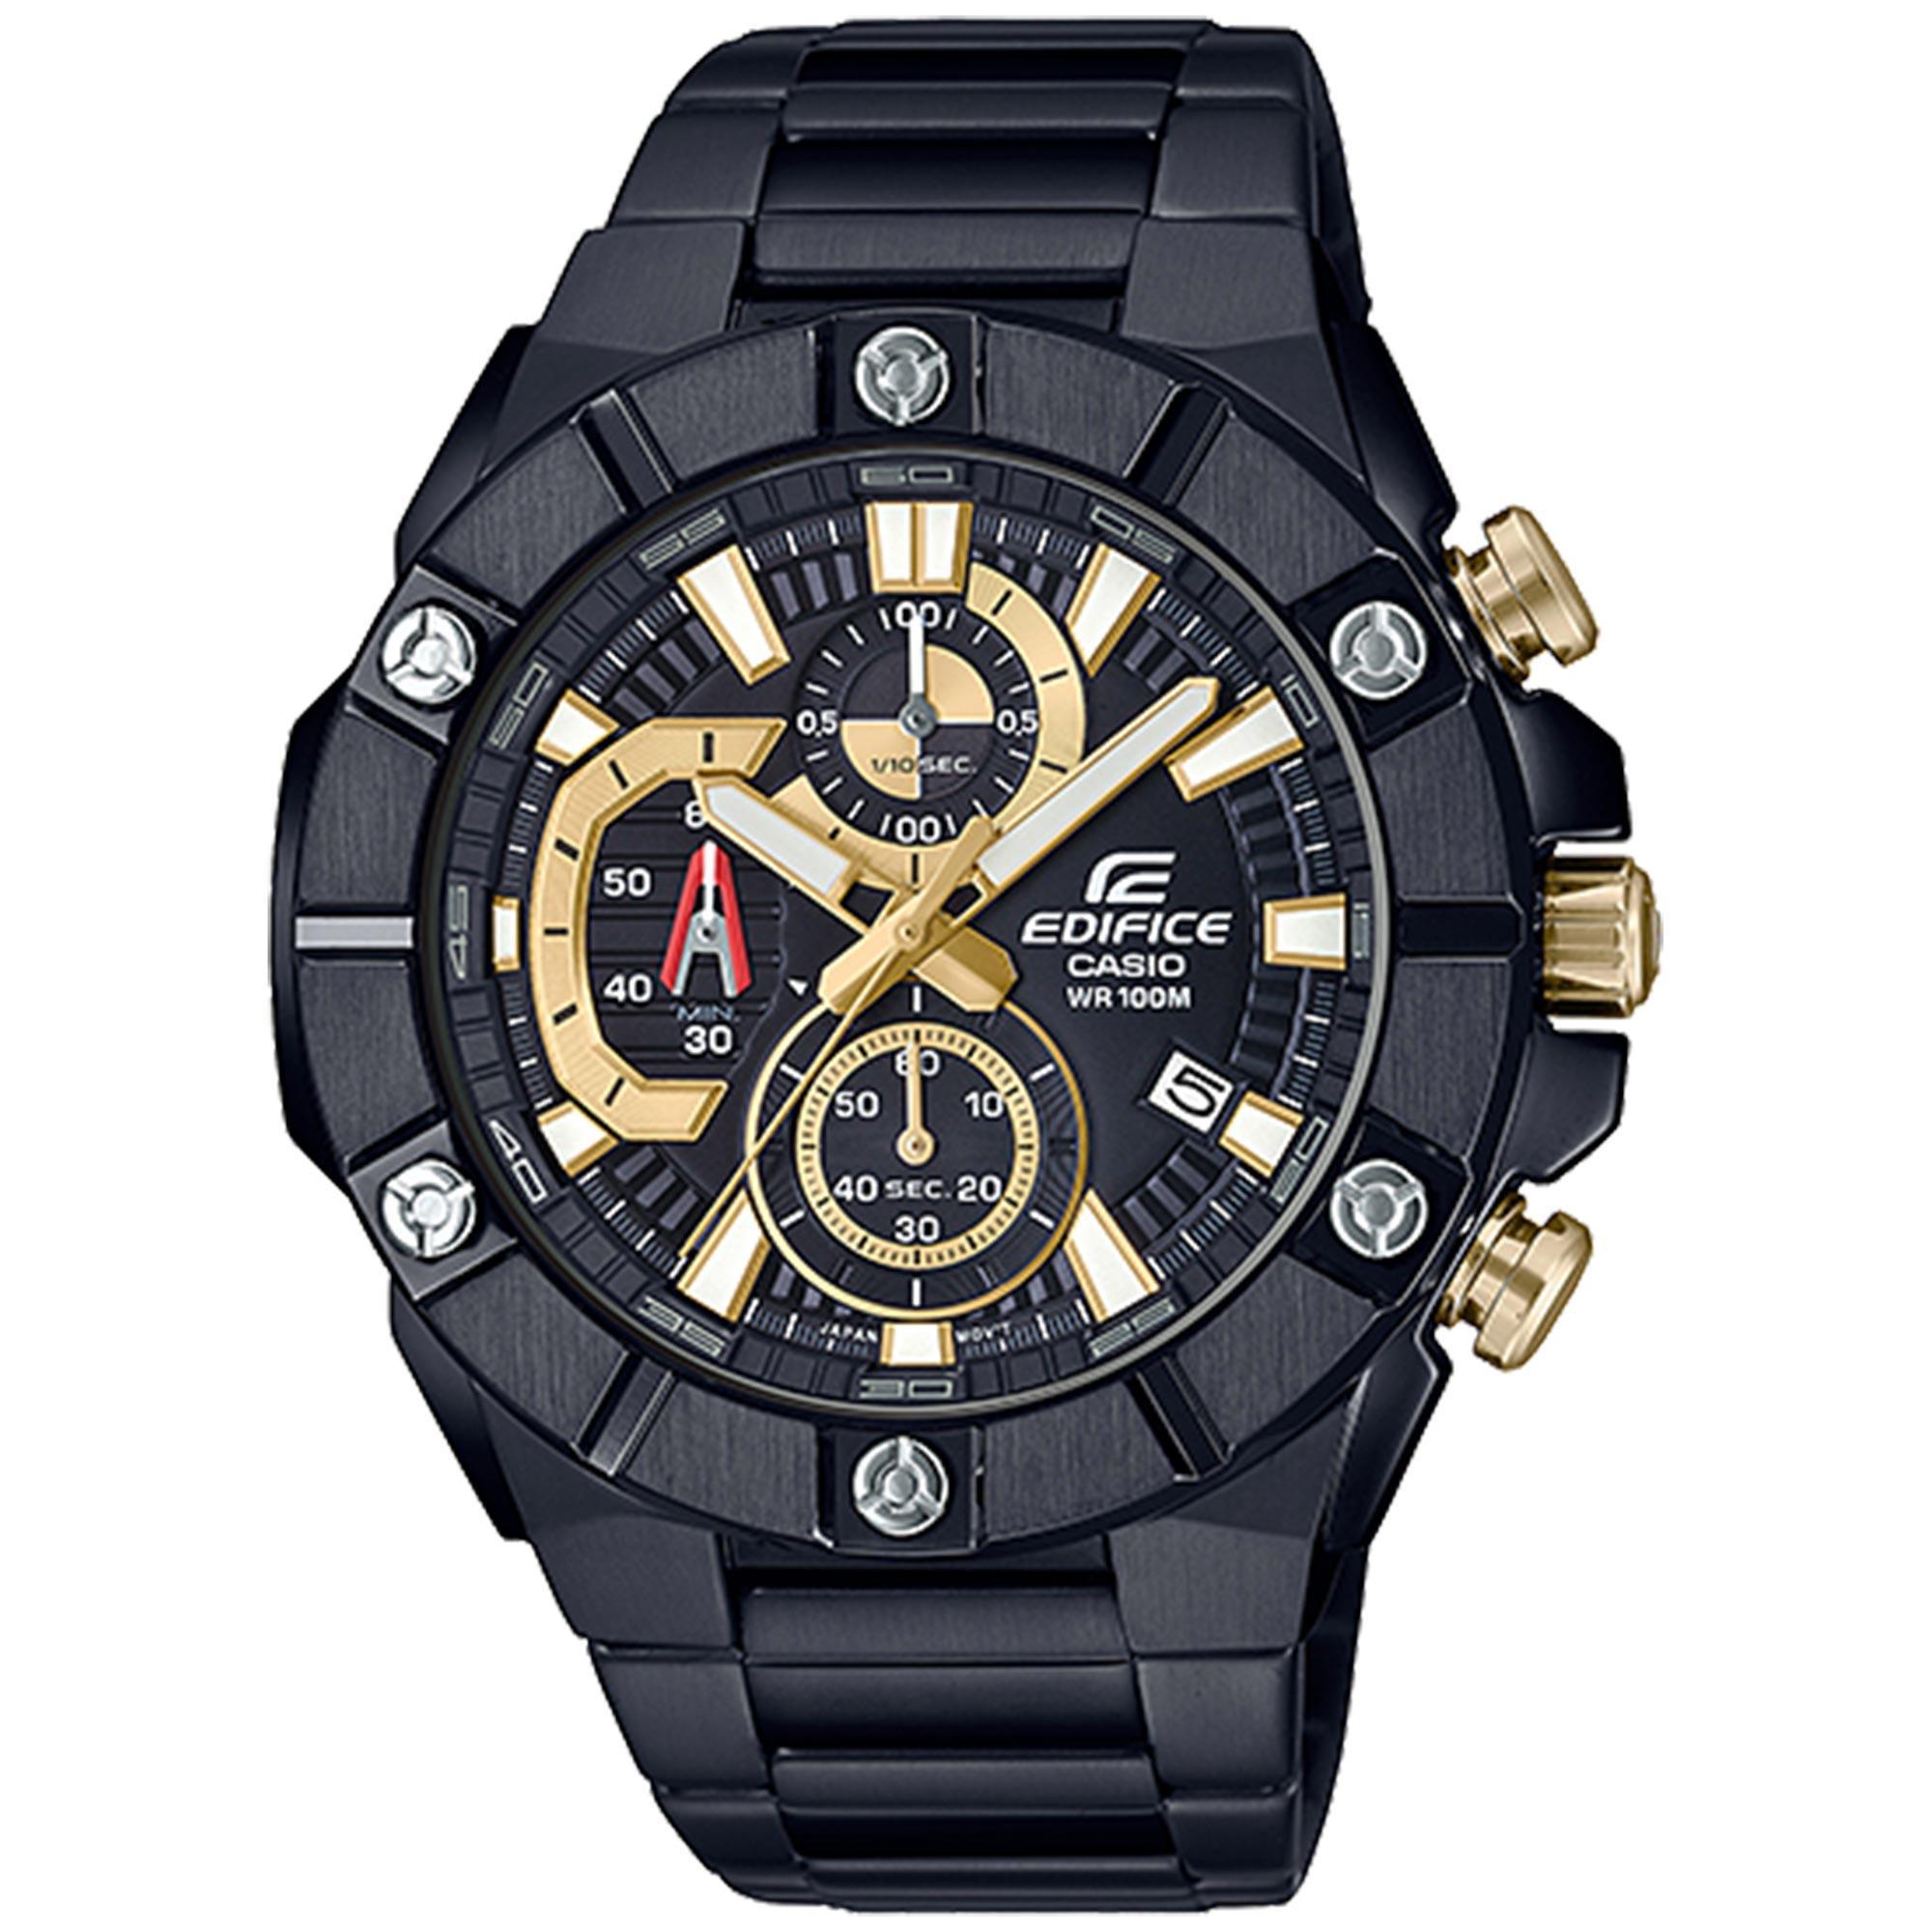 Casio Edifice Quartz Black Dial IP Plated Steel Oyster Bracelet Chronograph Men's Watch EFR-569DC-1AVUEF RRP £350